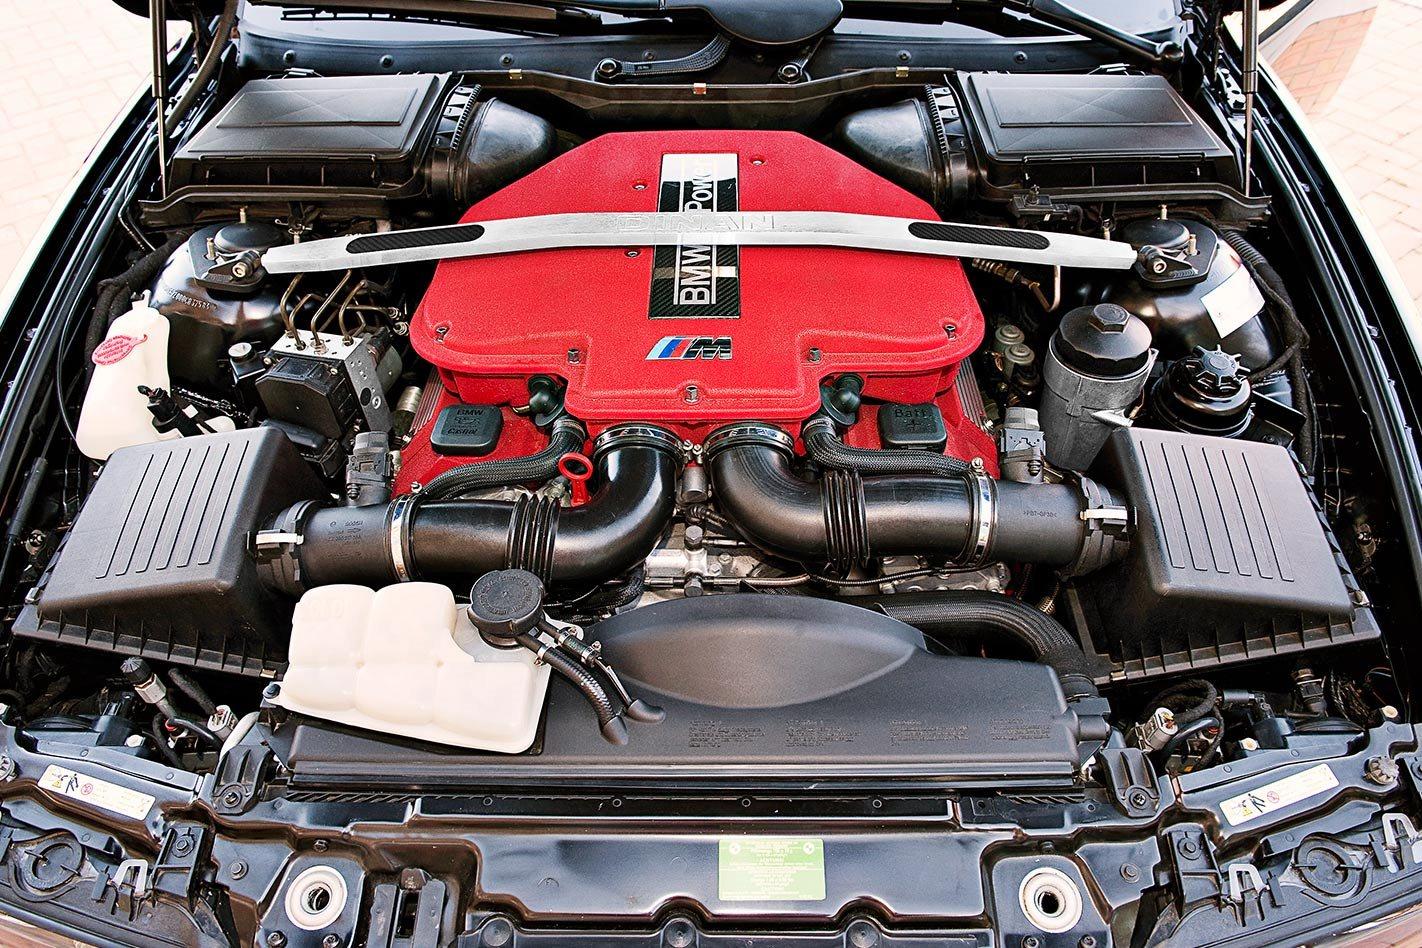 BMW M5 engine